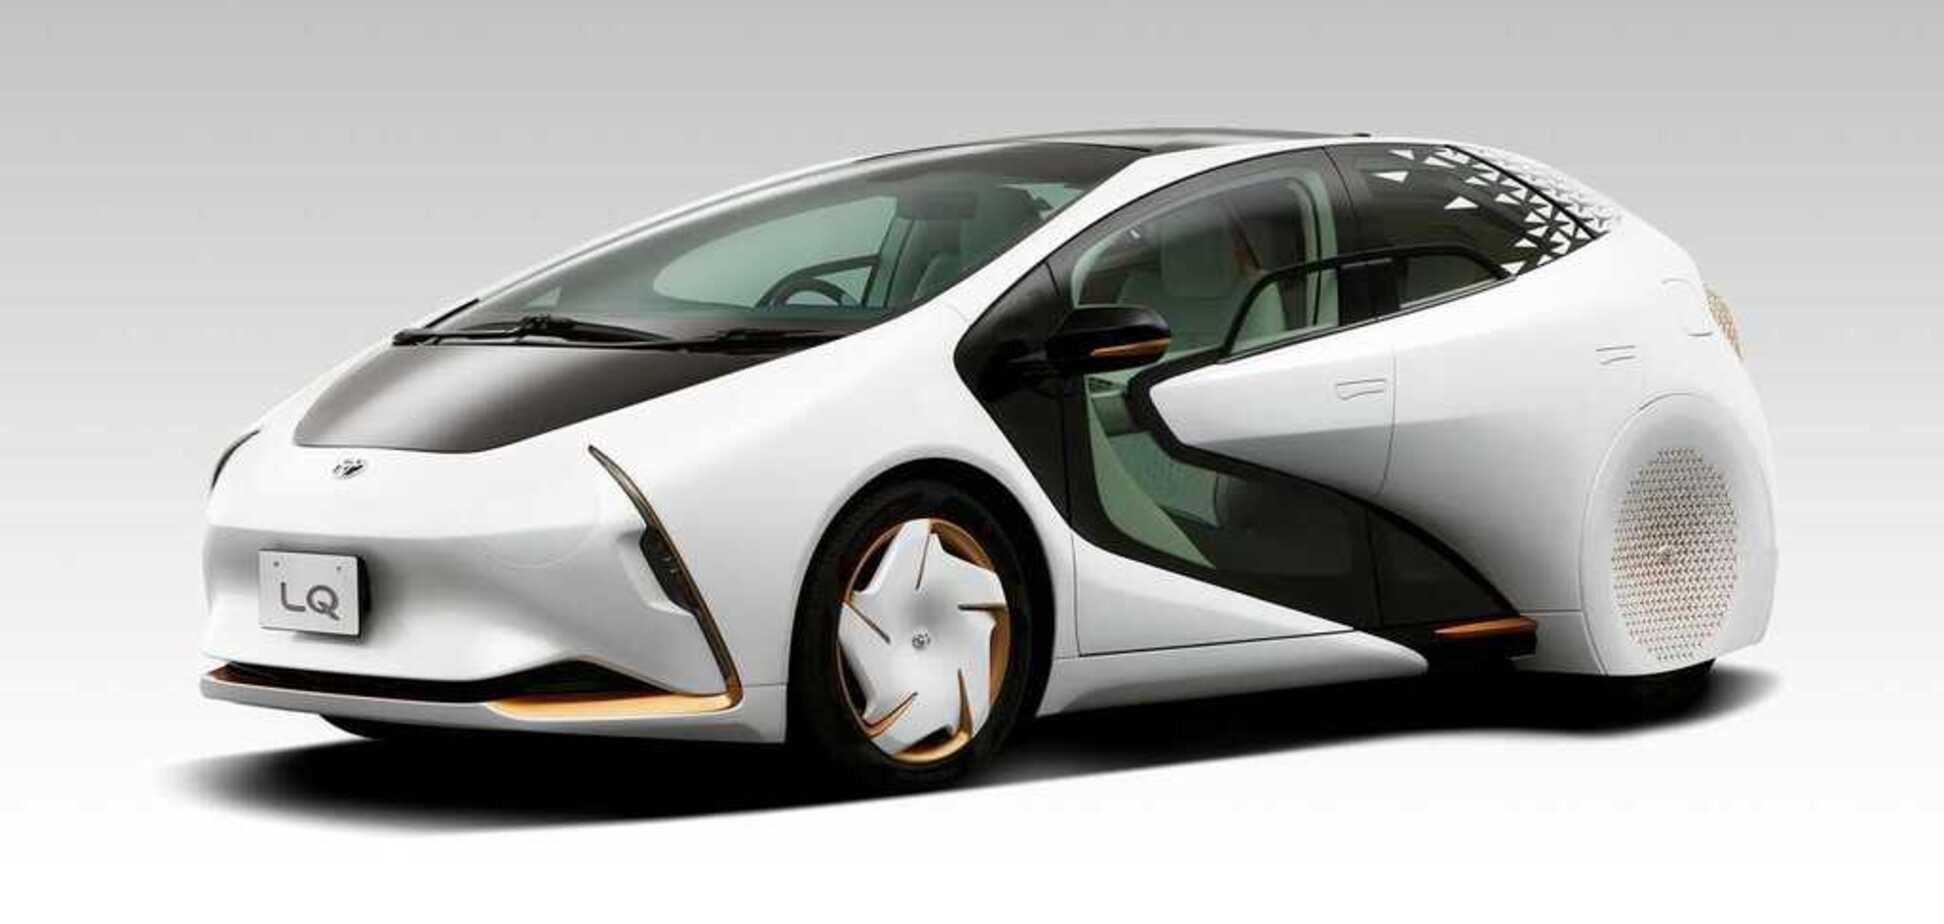 Электрокар будущего: Toyota показала шокирующий концепт